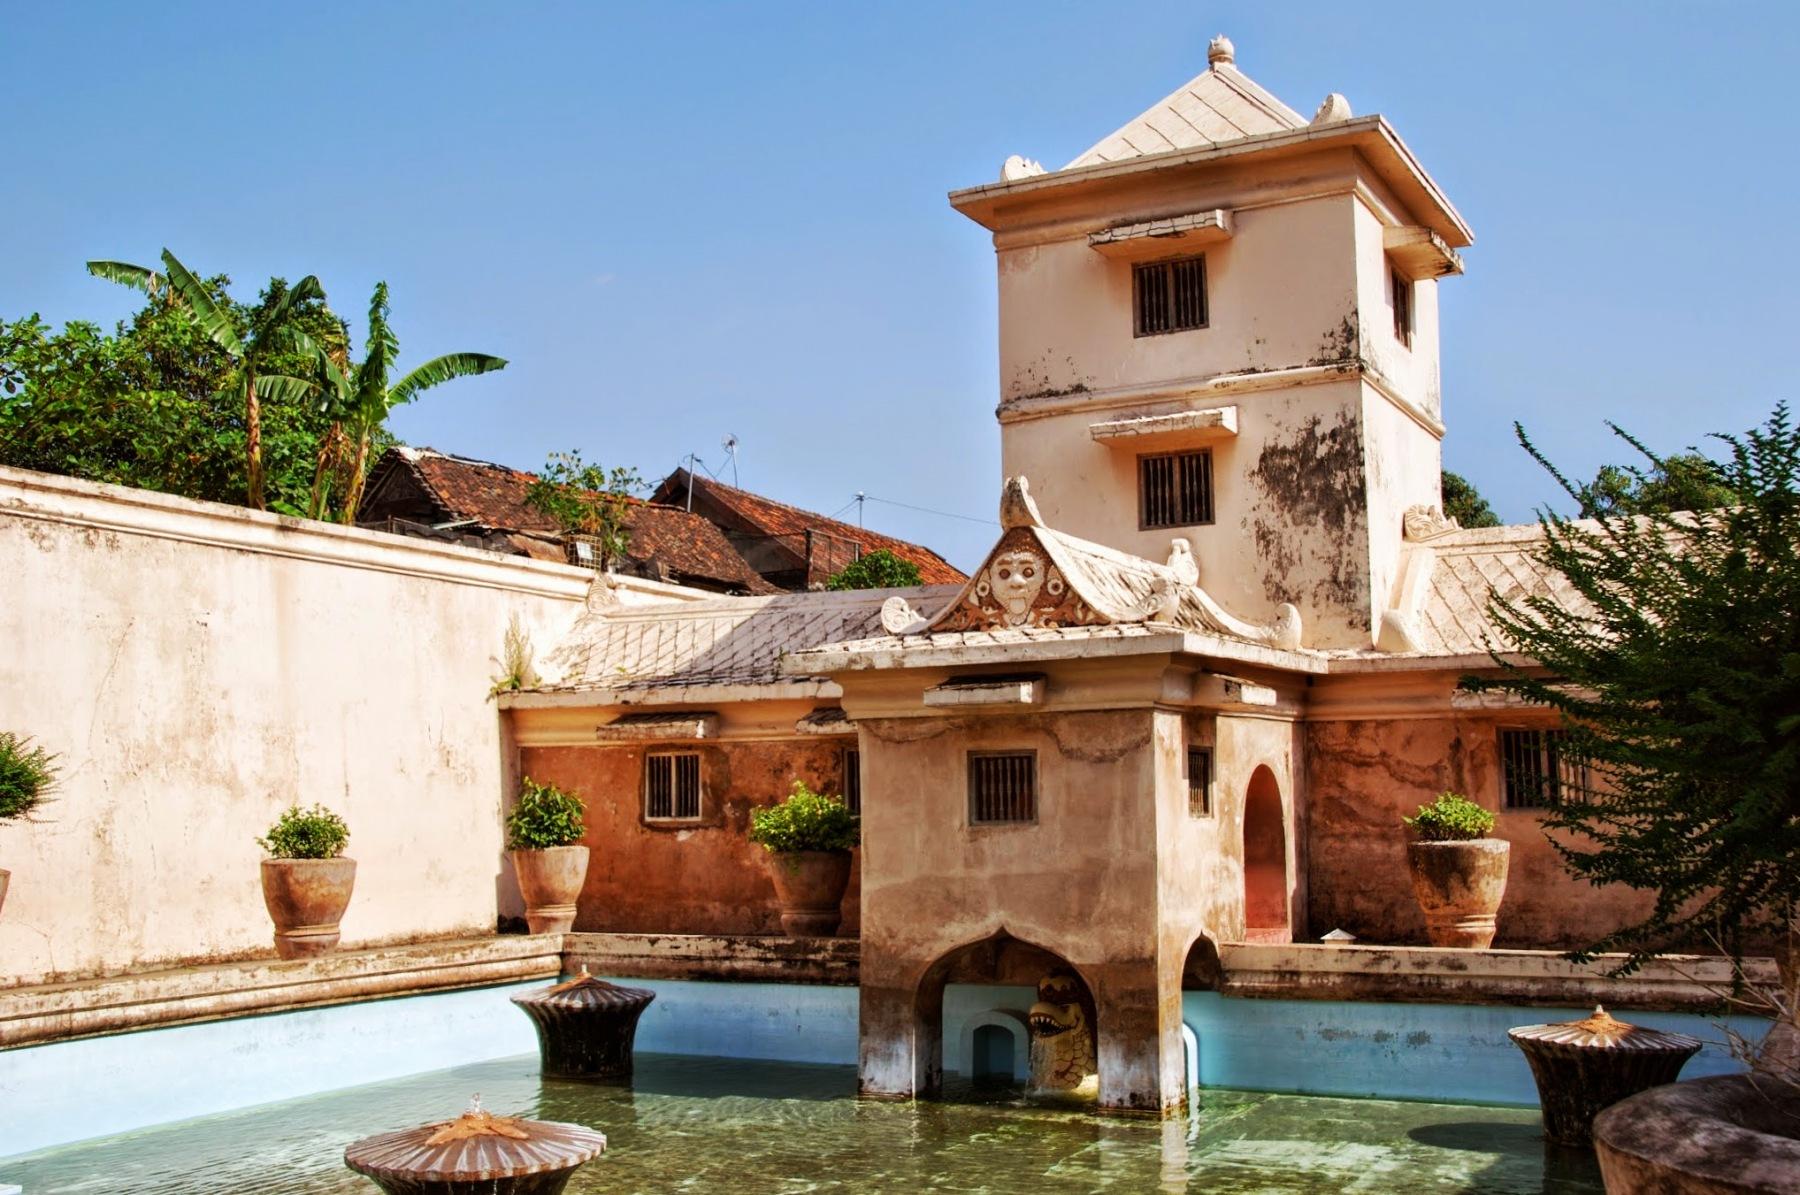 Jawa - Yogyakarta - Taman Sari - pałac wodny